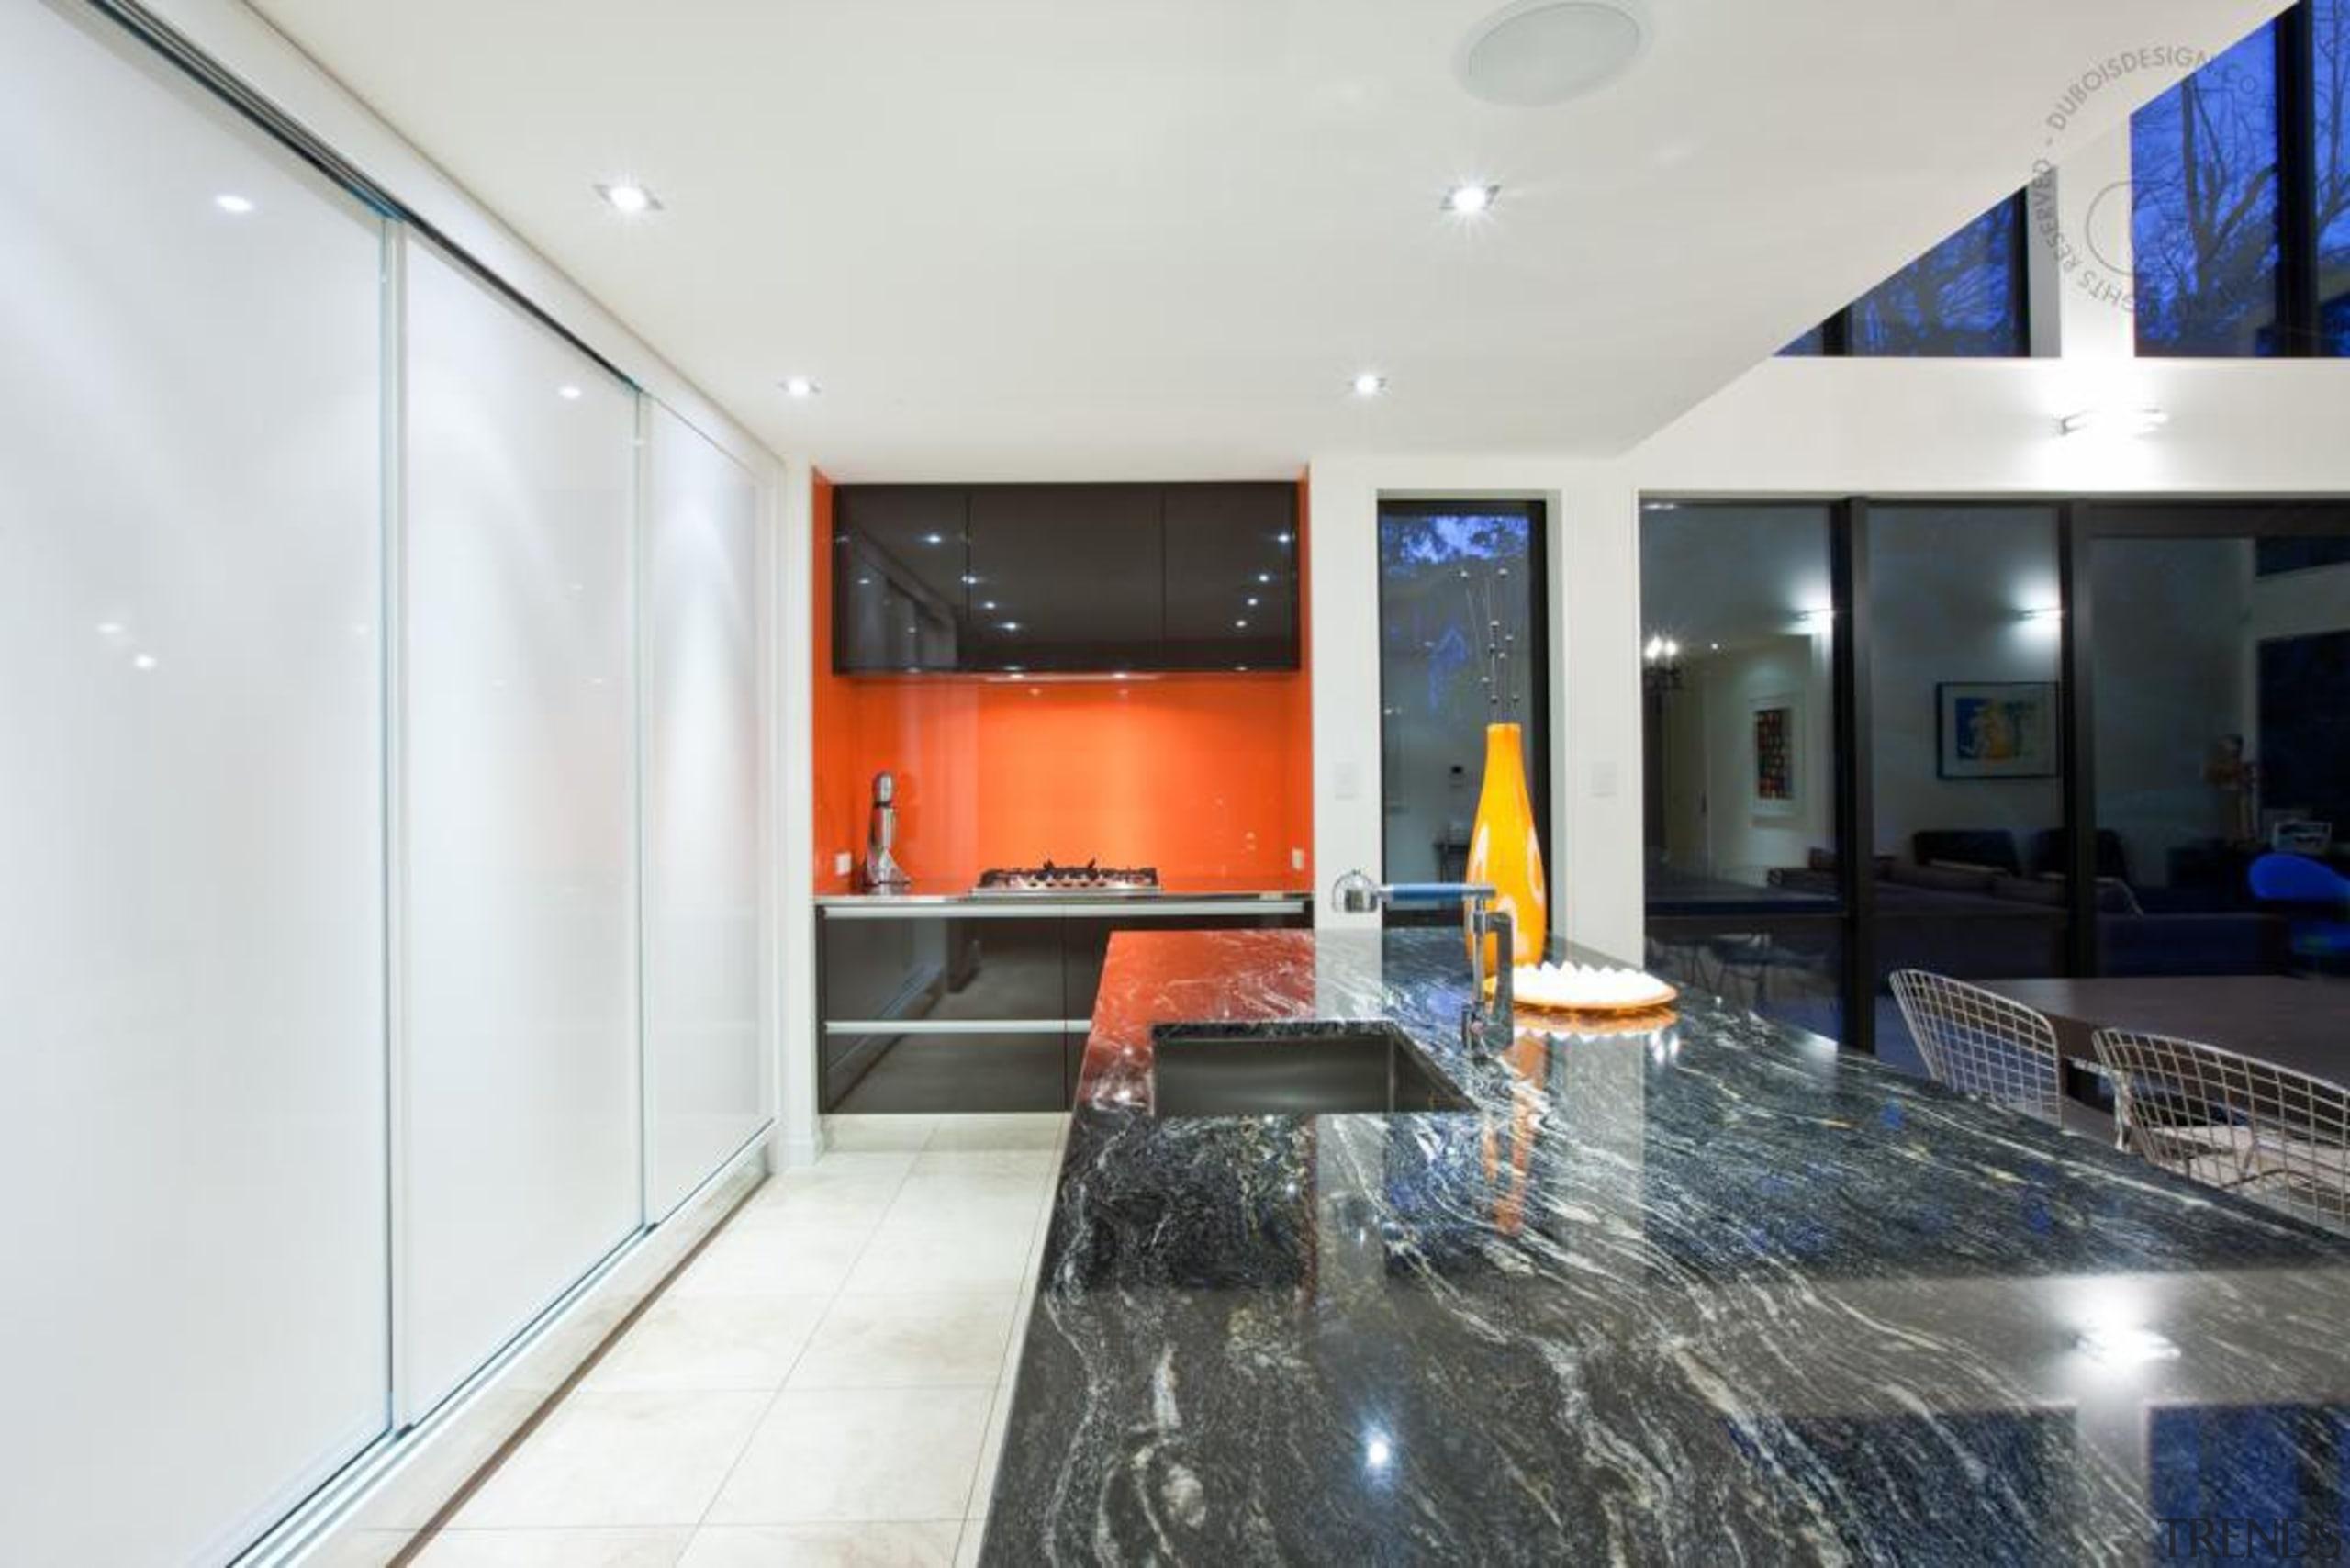 Simplistic Kitchen - Simplistic Kitchen - ceiling | ceiling, floor, interior design, living room, property, real estate, white